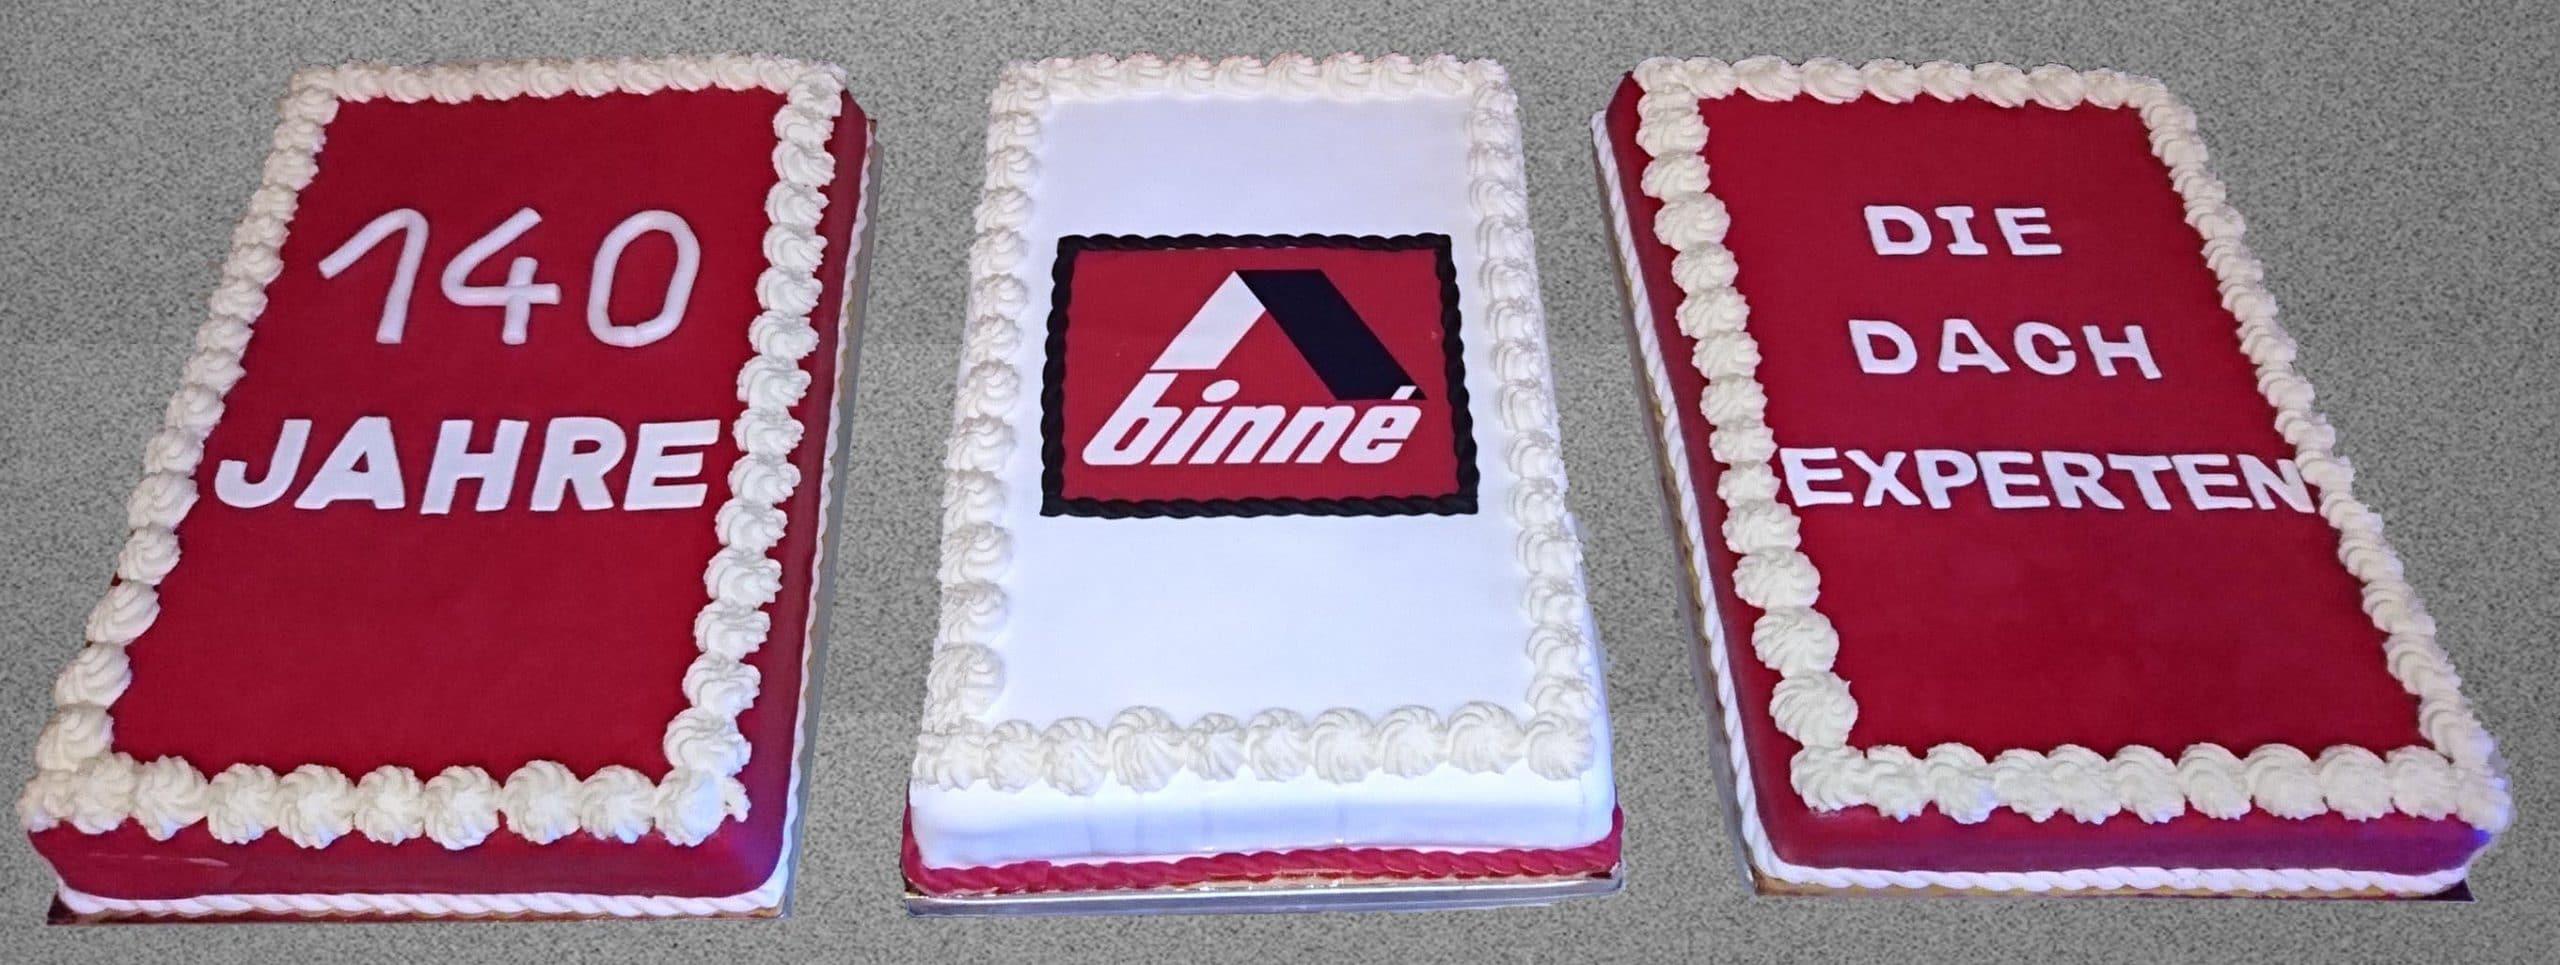 Torte Sommerfeier Binné 140 Jahre